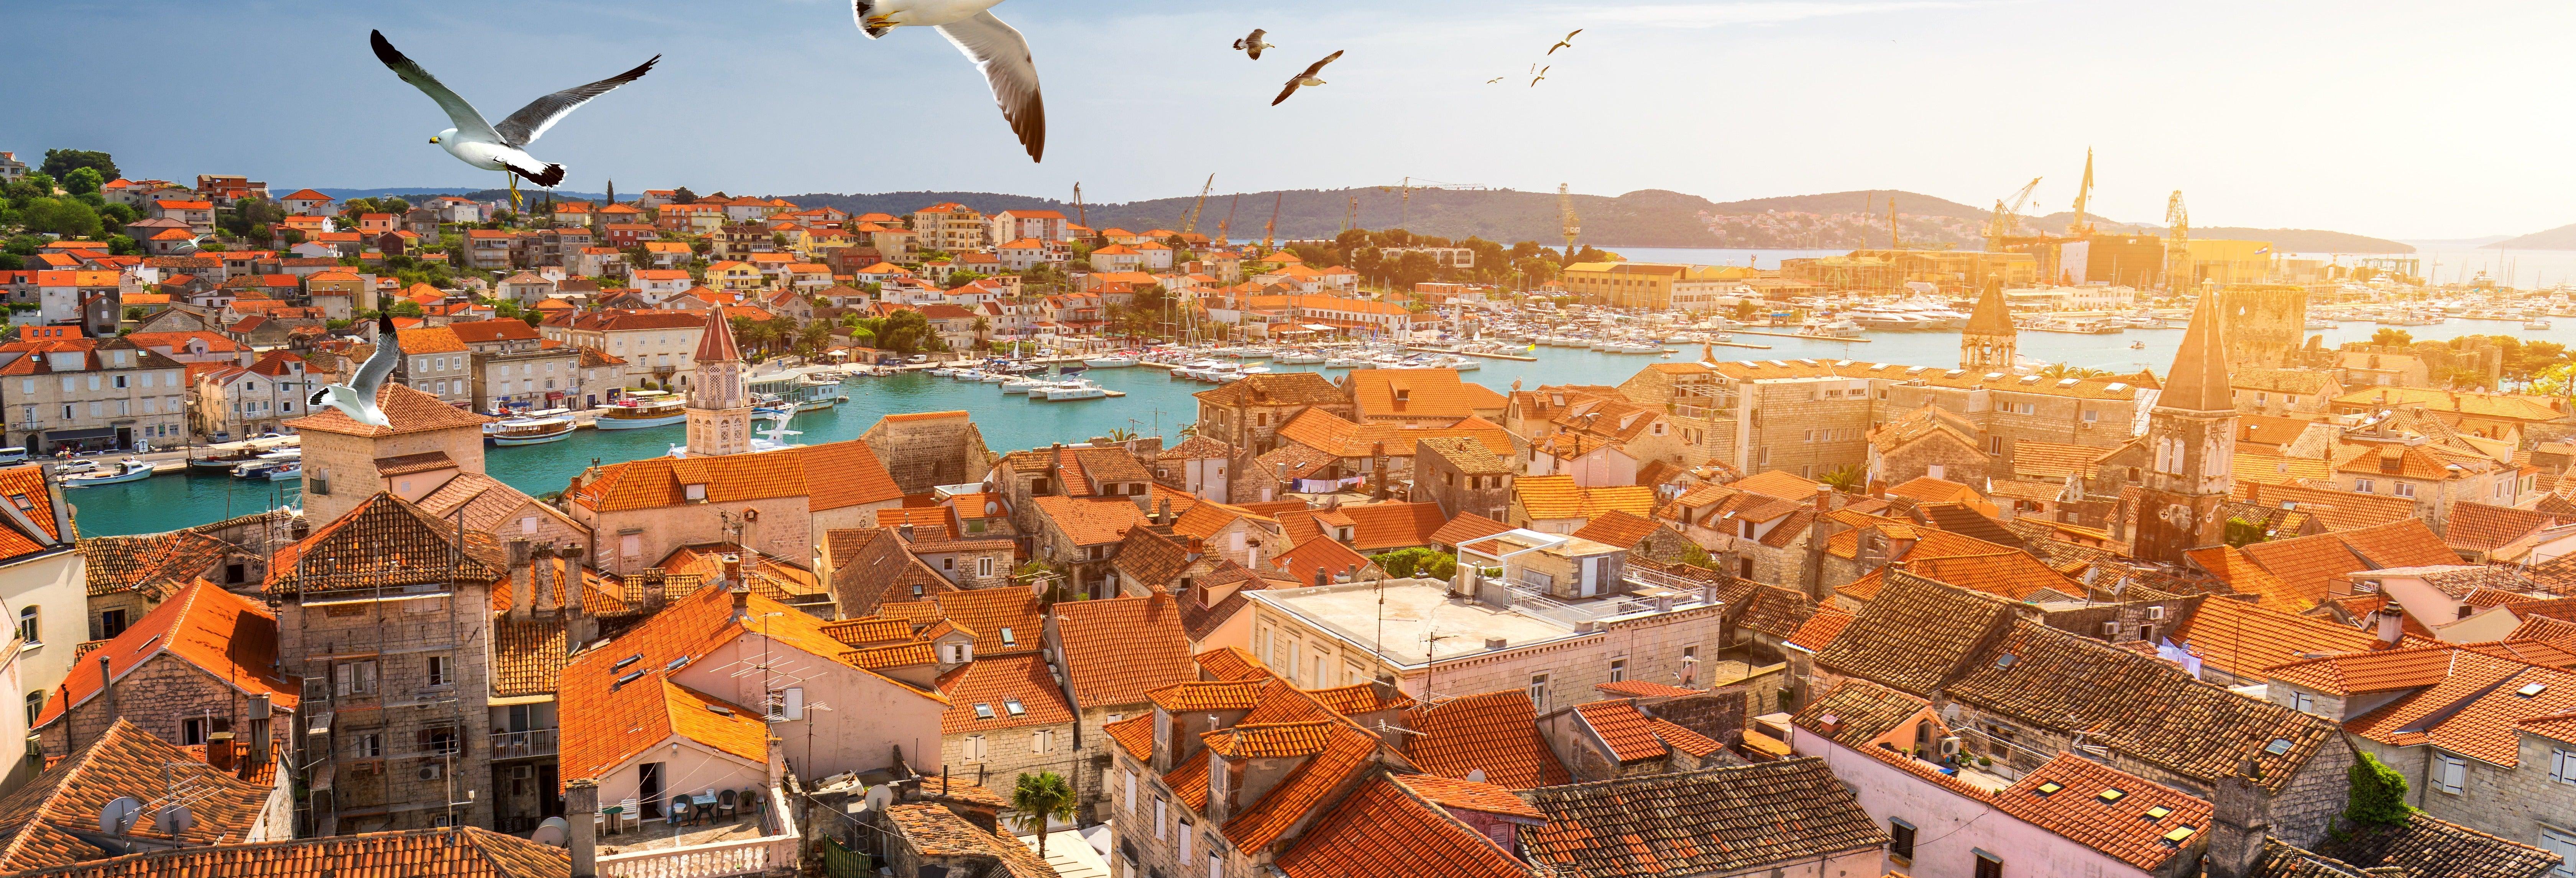 Tour de 5 días de Dubrovnik a Trogir